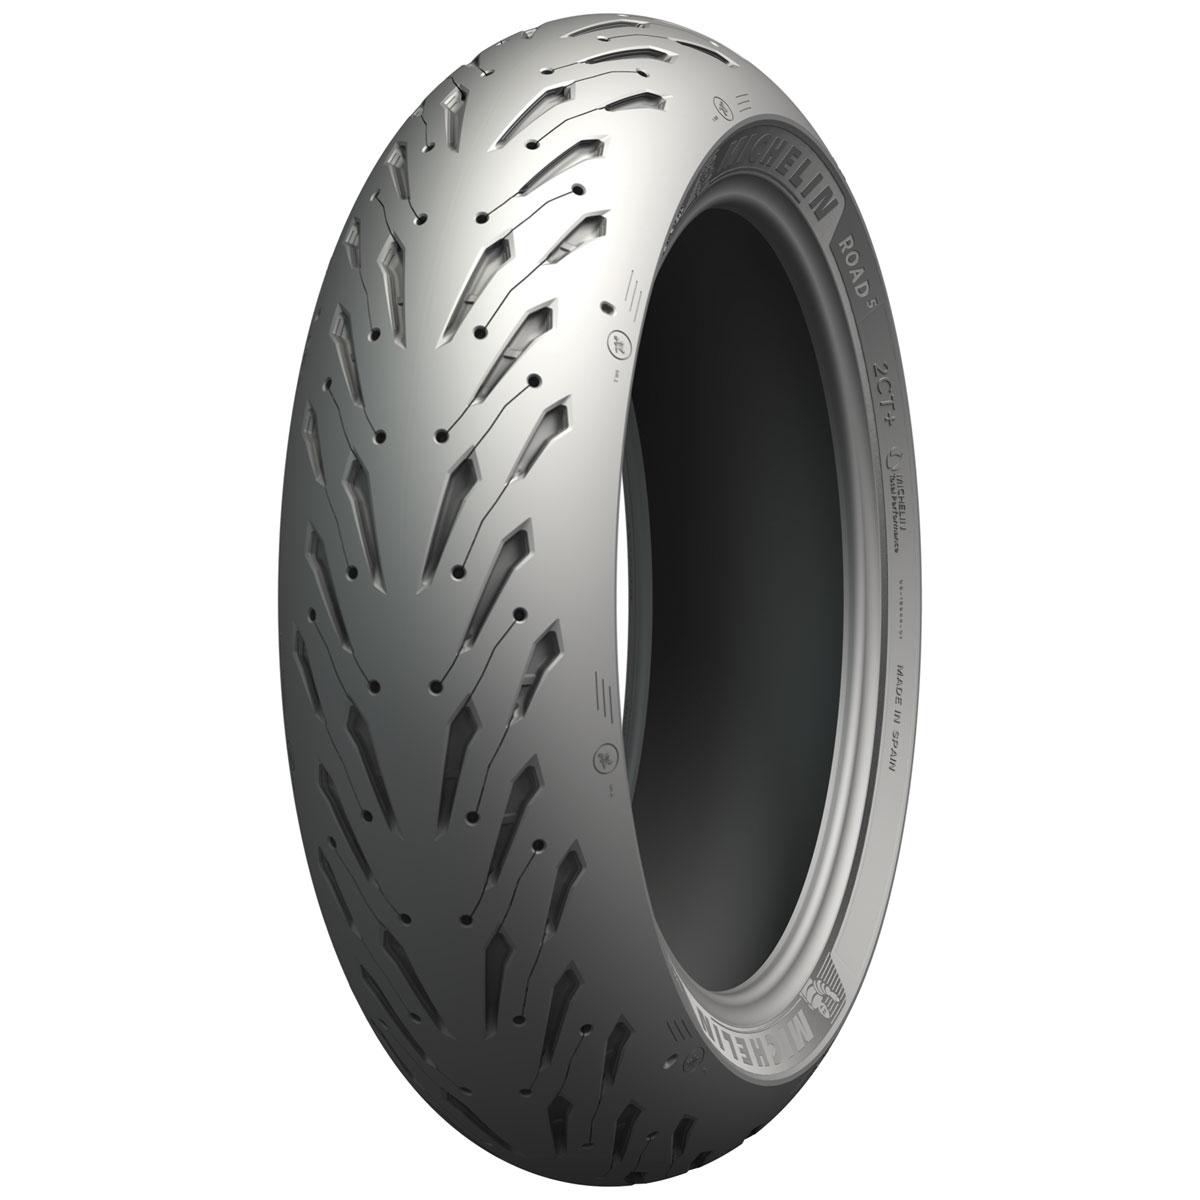 Michelin Road 5 180/55ZR17 Rear Tire